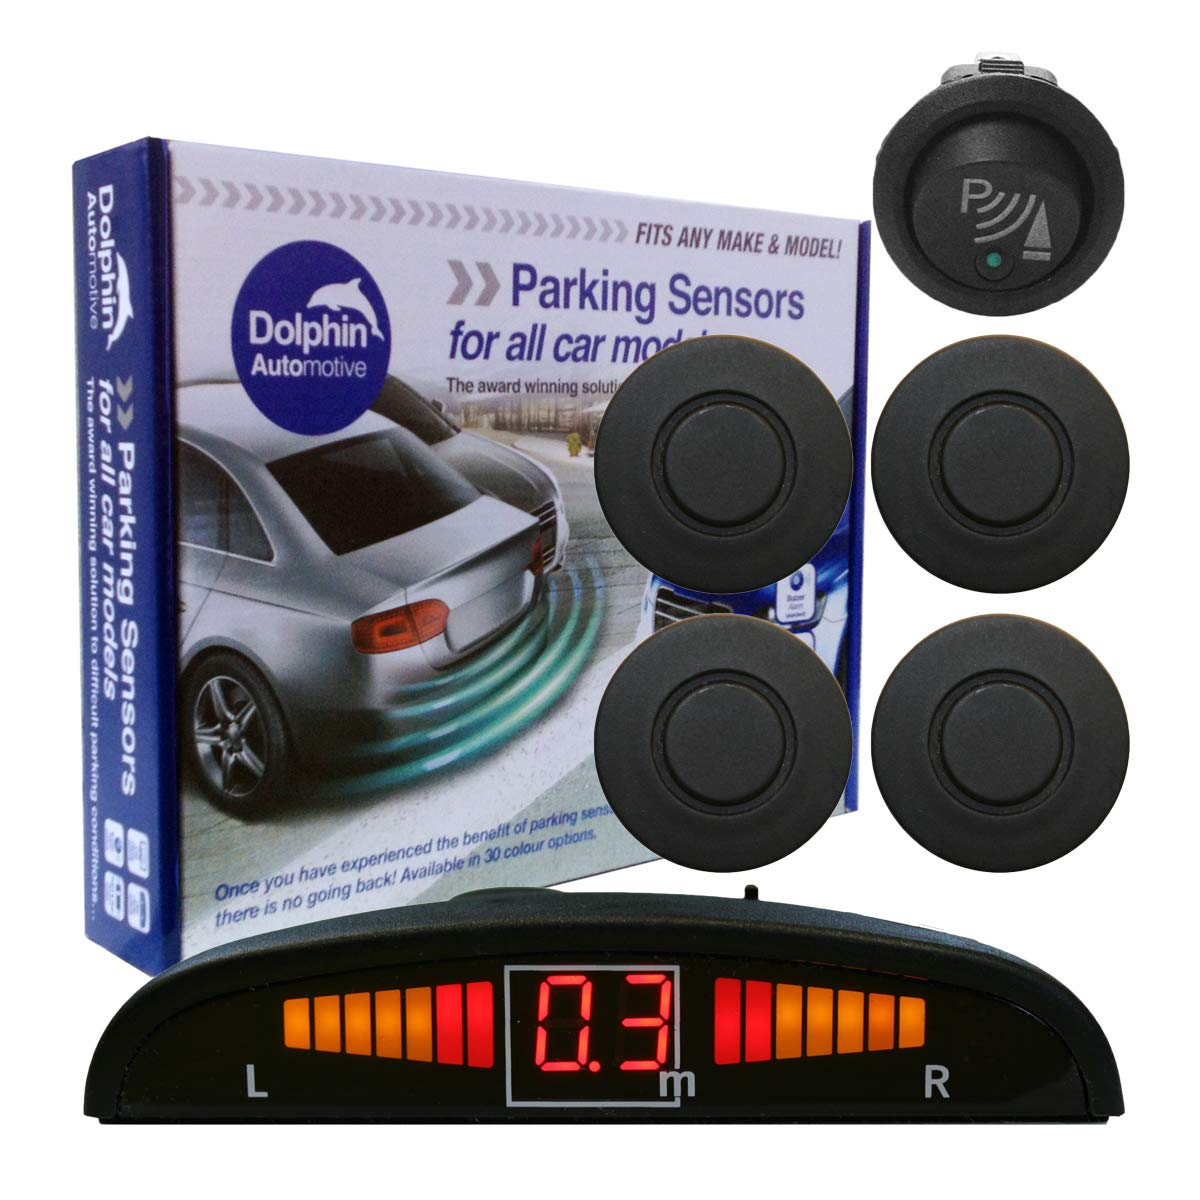 Dolphin DPS450F Front Parking Sensors In 32 Colours 4 Ultrasonic Radar Sensors Kit Audio /& Display Alert System Matt /& Gloss Black Maroon 30 More Colours